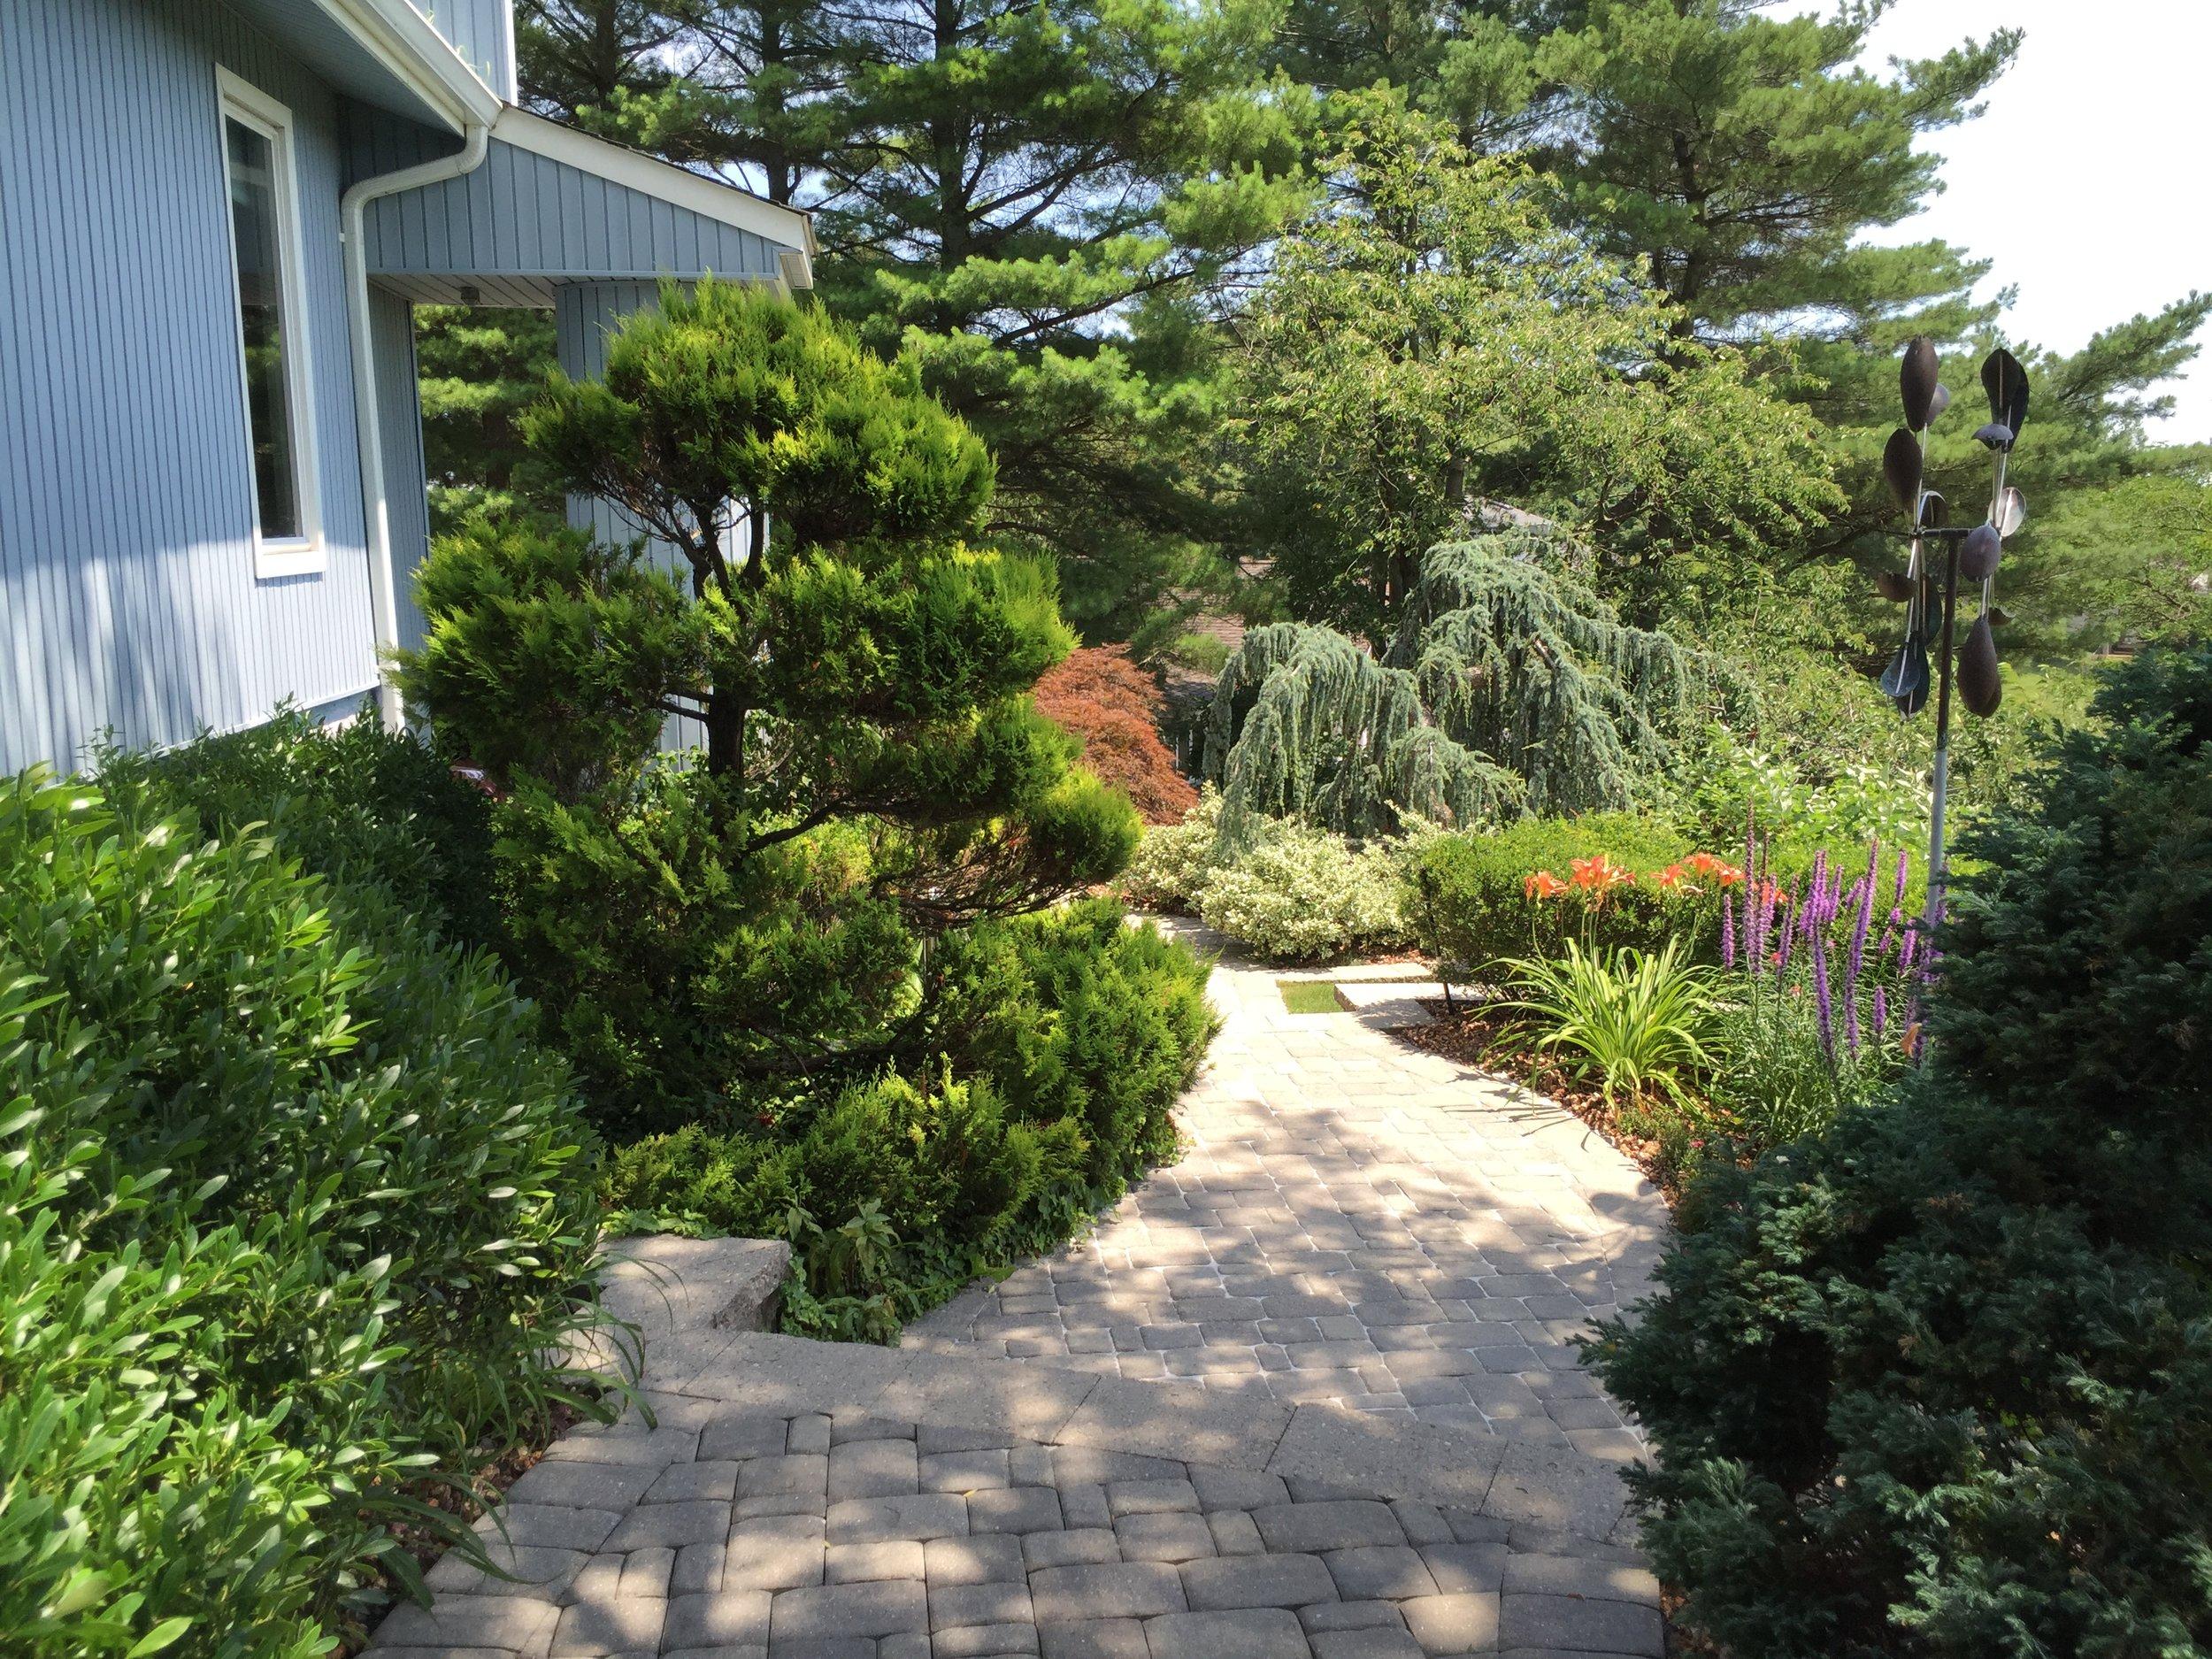 View Project Featuring Landscape Design:  Lush Landscape    VIEW PROJECT